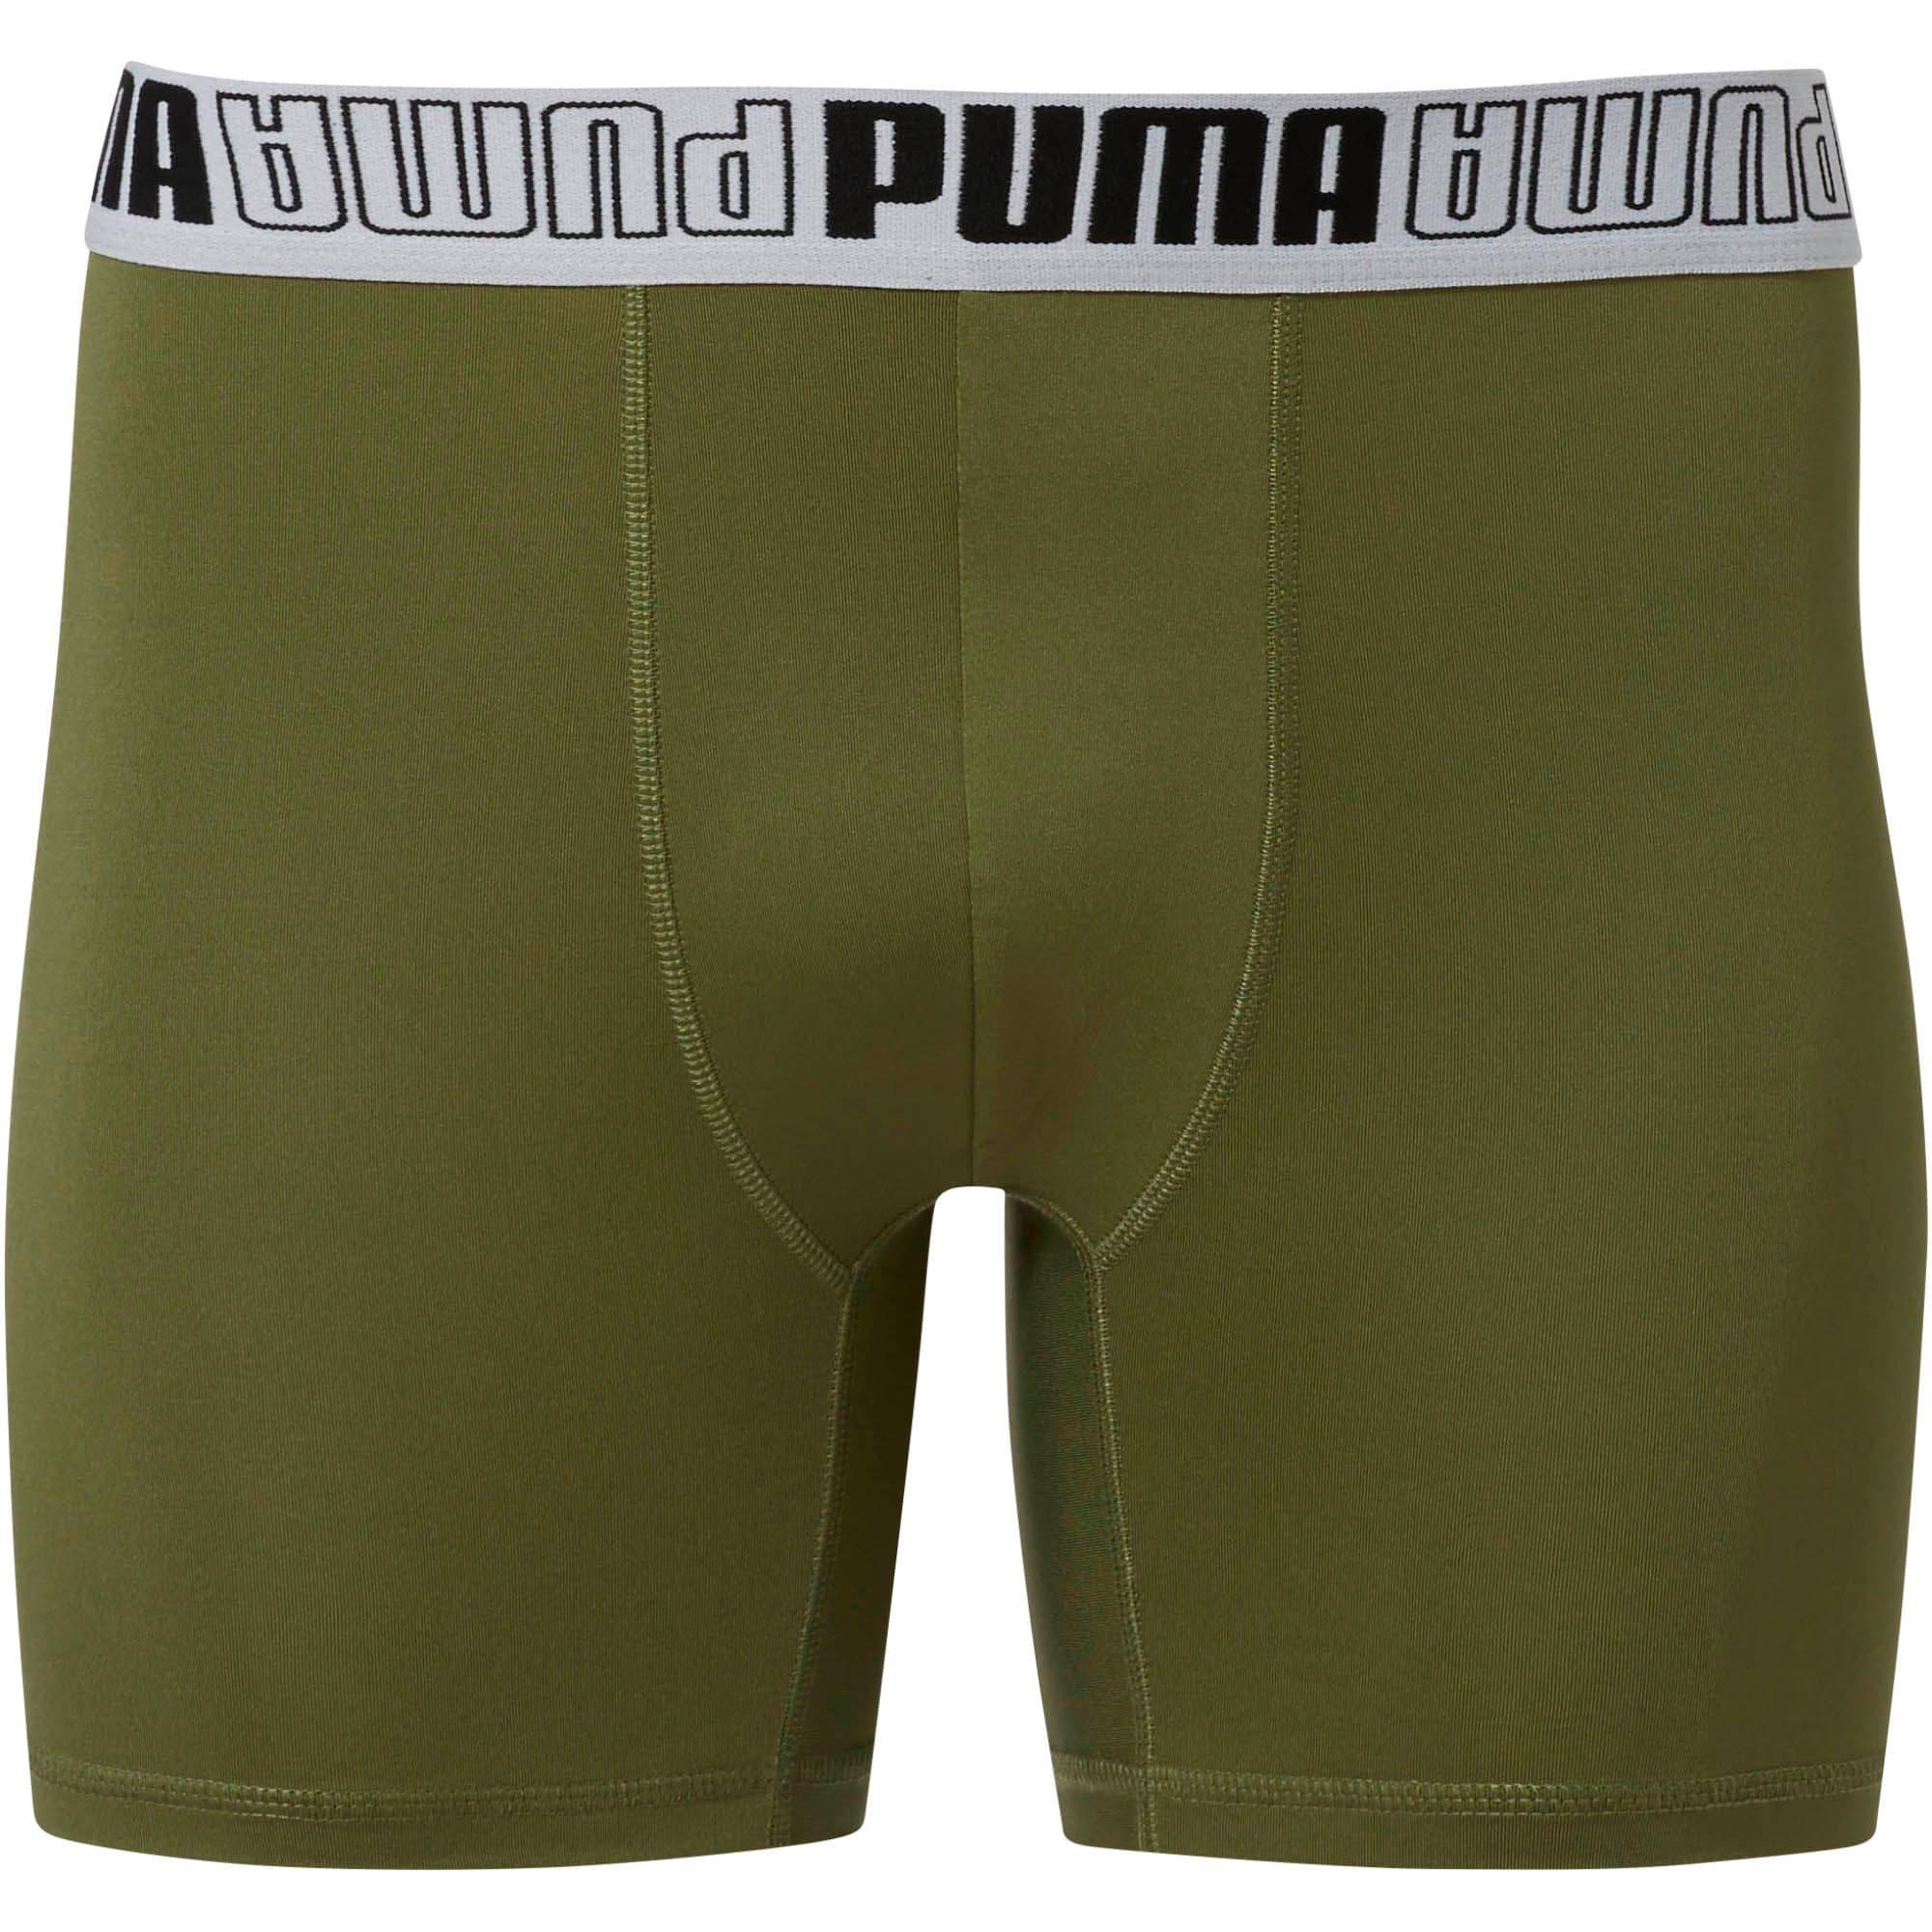 Thumbnail 3 of Men's Tech Boxer Briefs [3 Pack], BRIGHT GREEN, medium